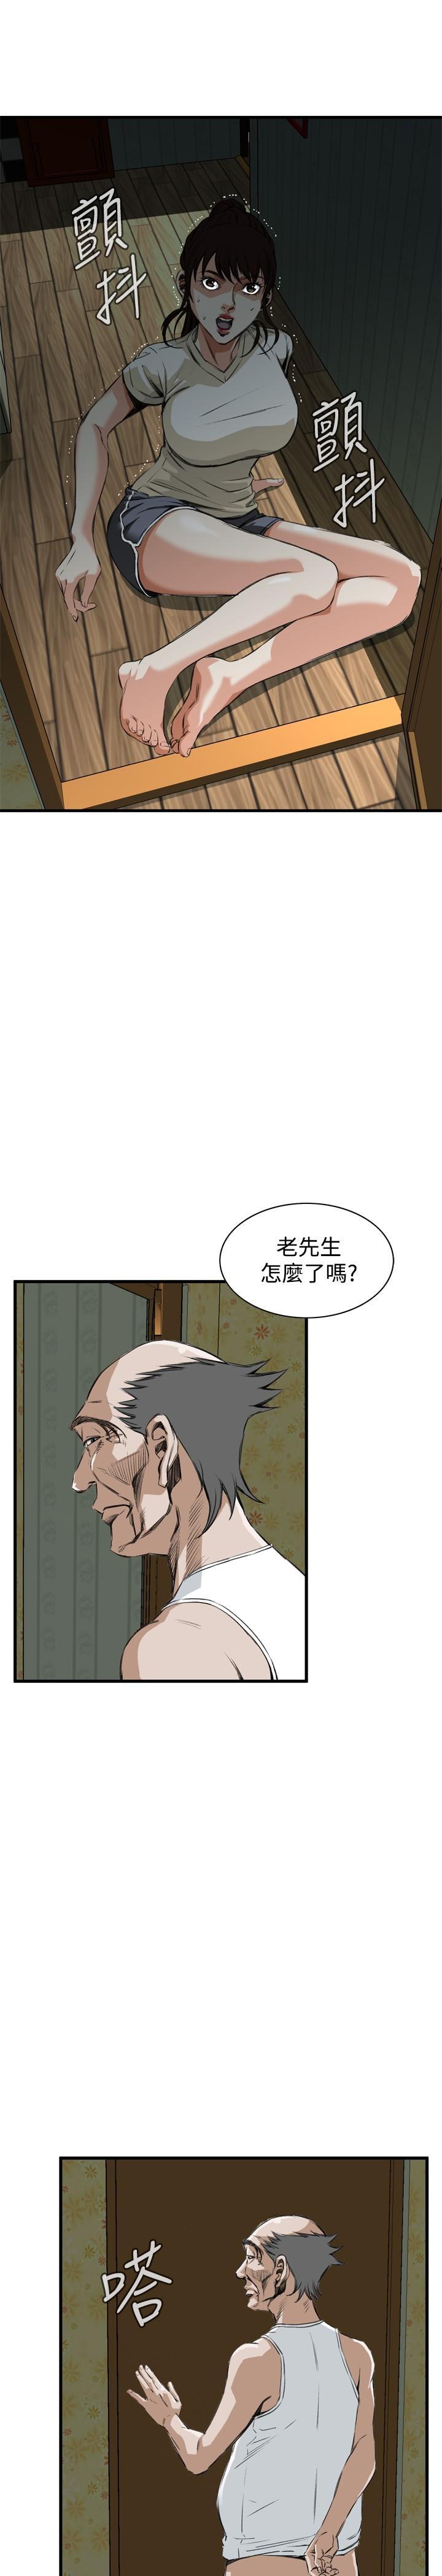 Take a Peek 偷窥 Ch.39~51 [Chinese]中文 179